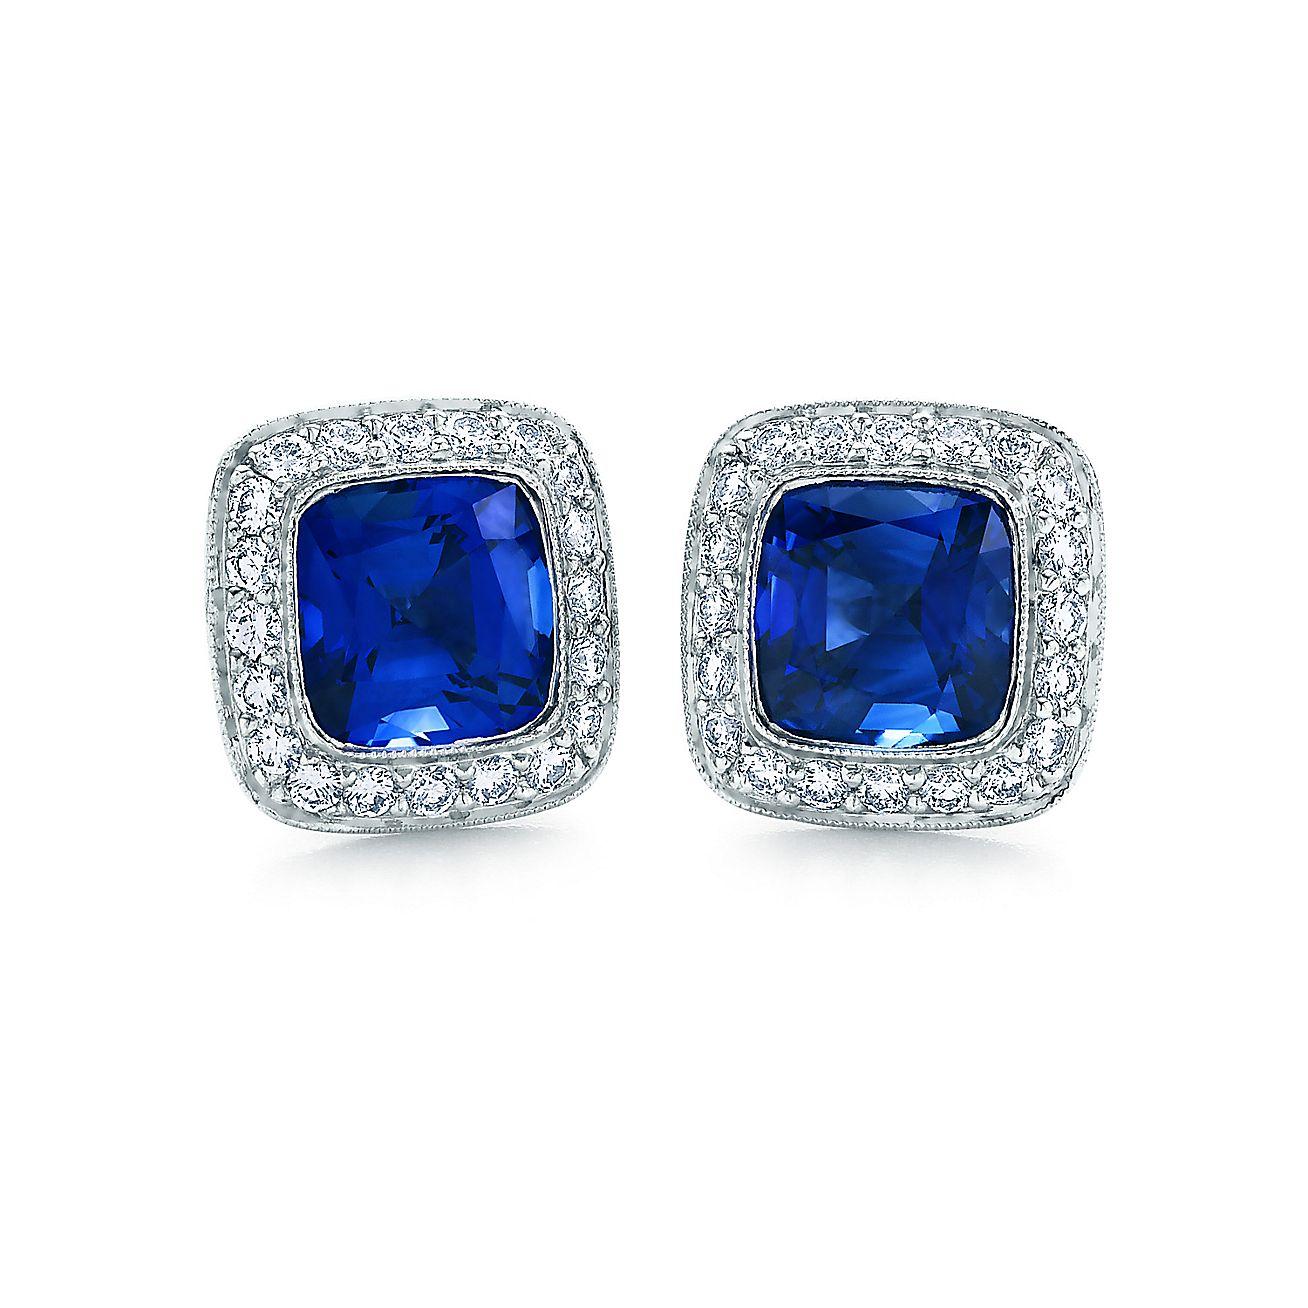 Tiffany Legacy®<br>sapphire earrings